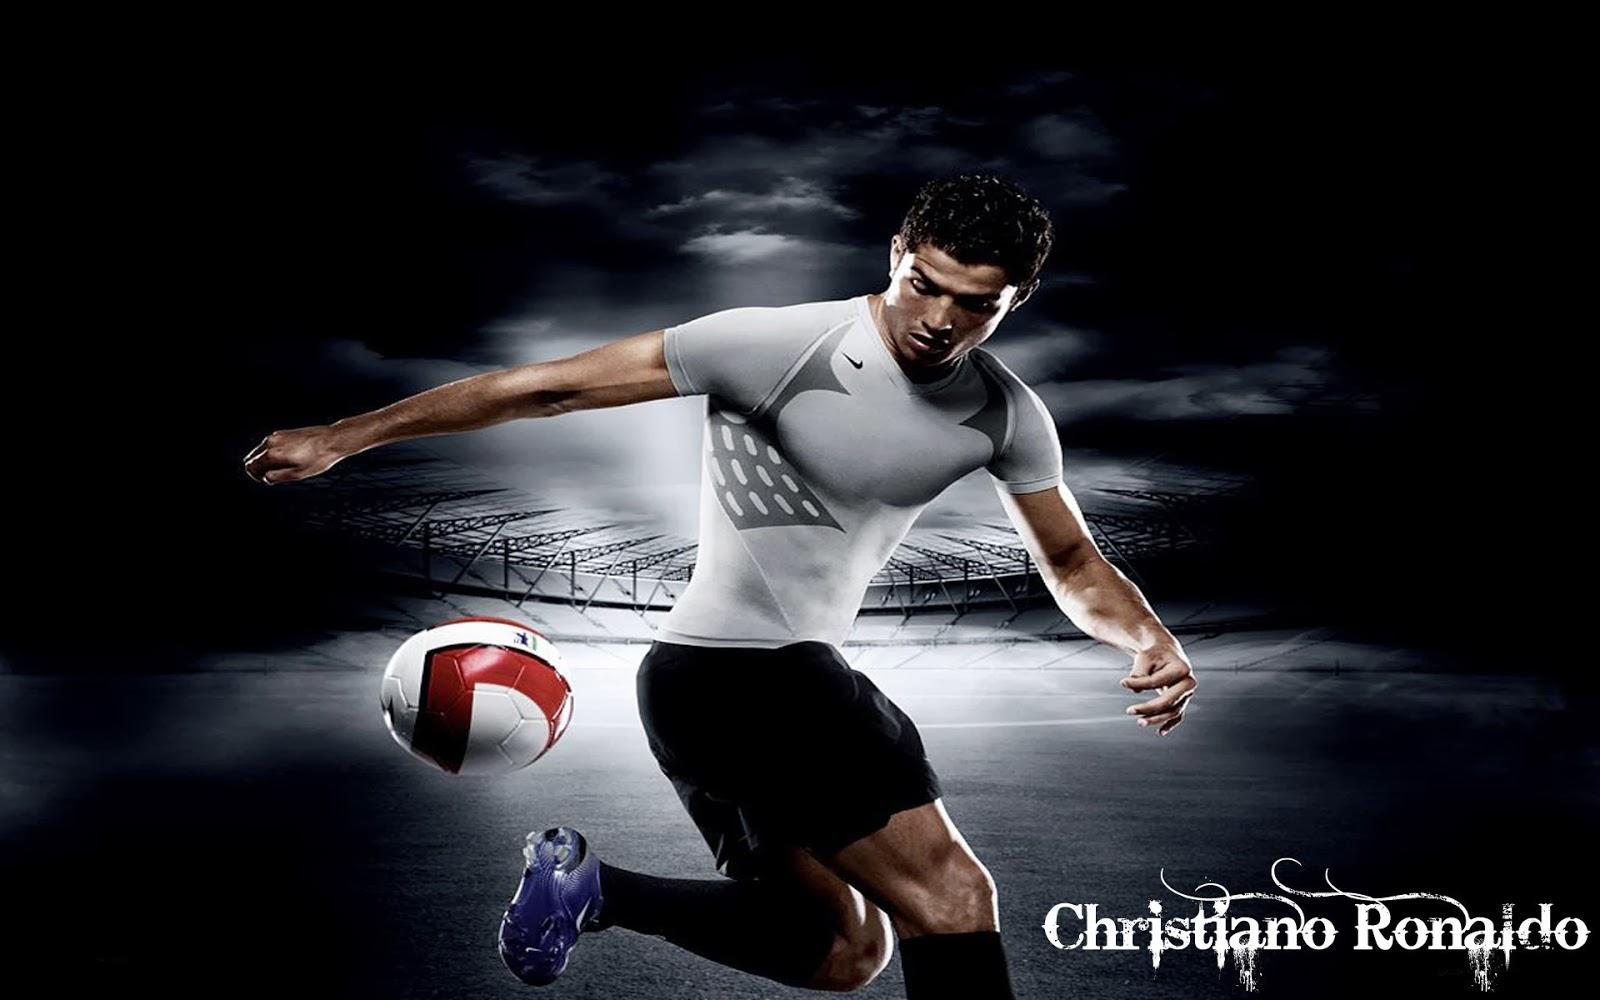 Cristiano Ronaldo HD Wallpaper,Images,Pics